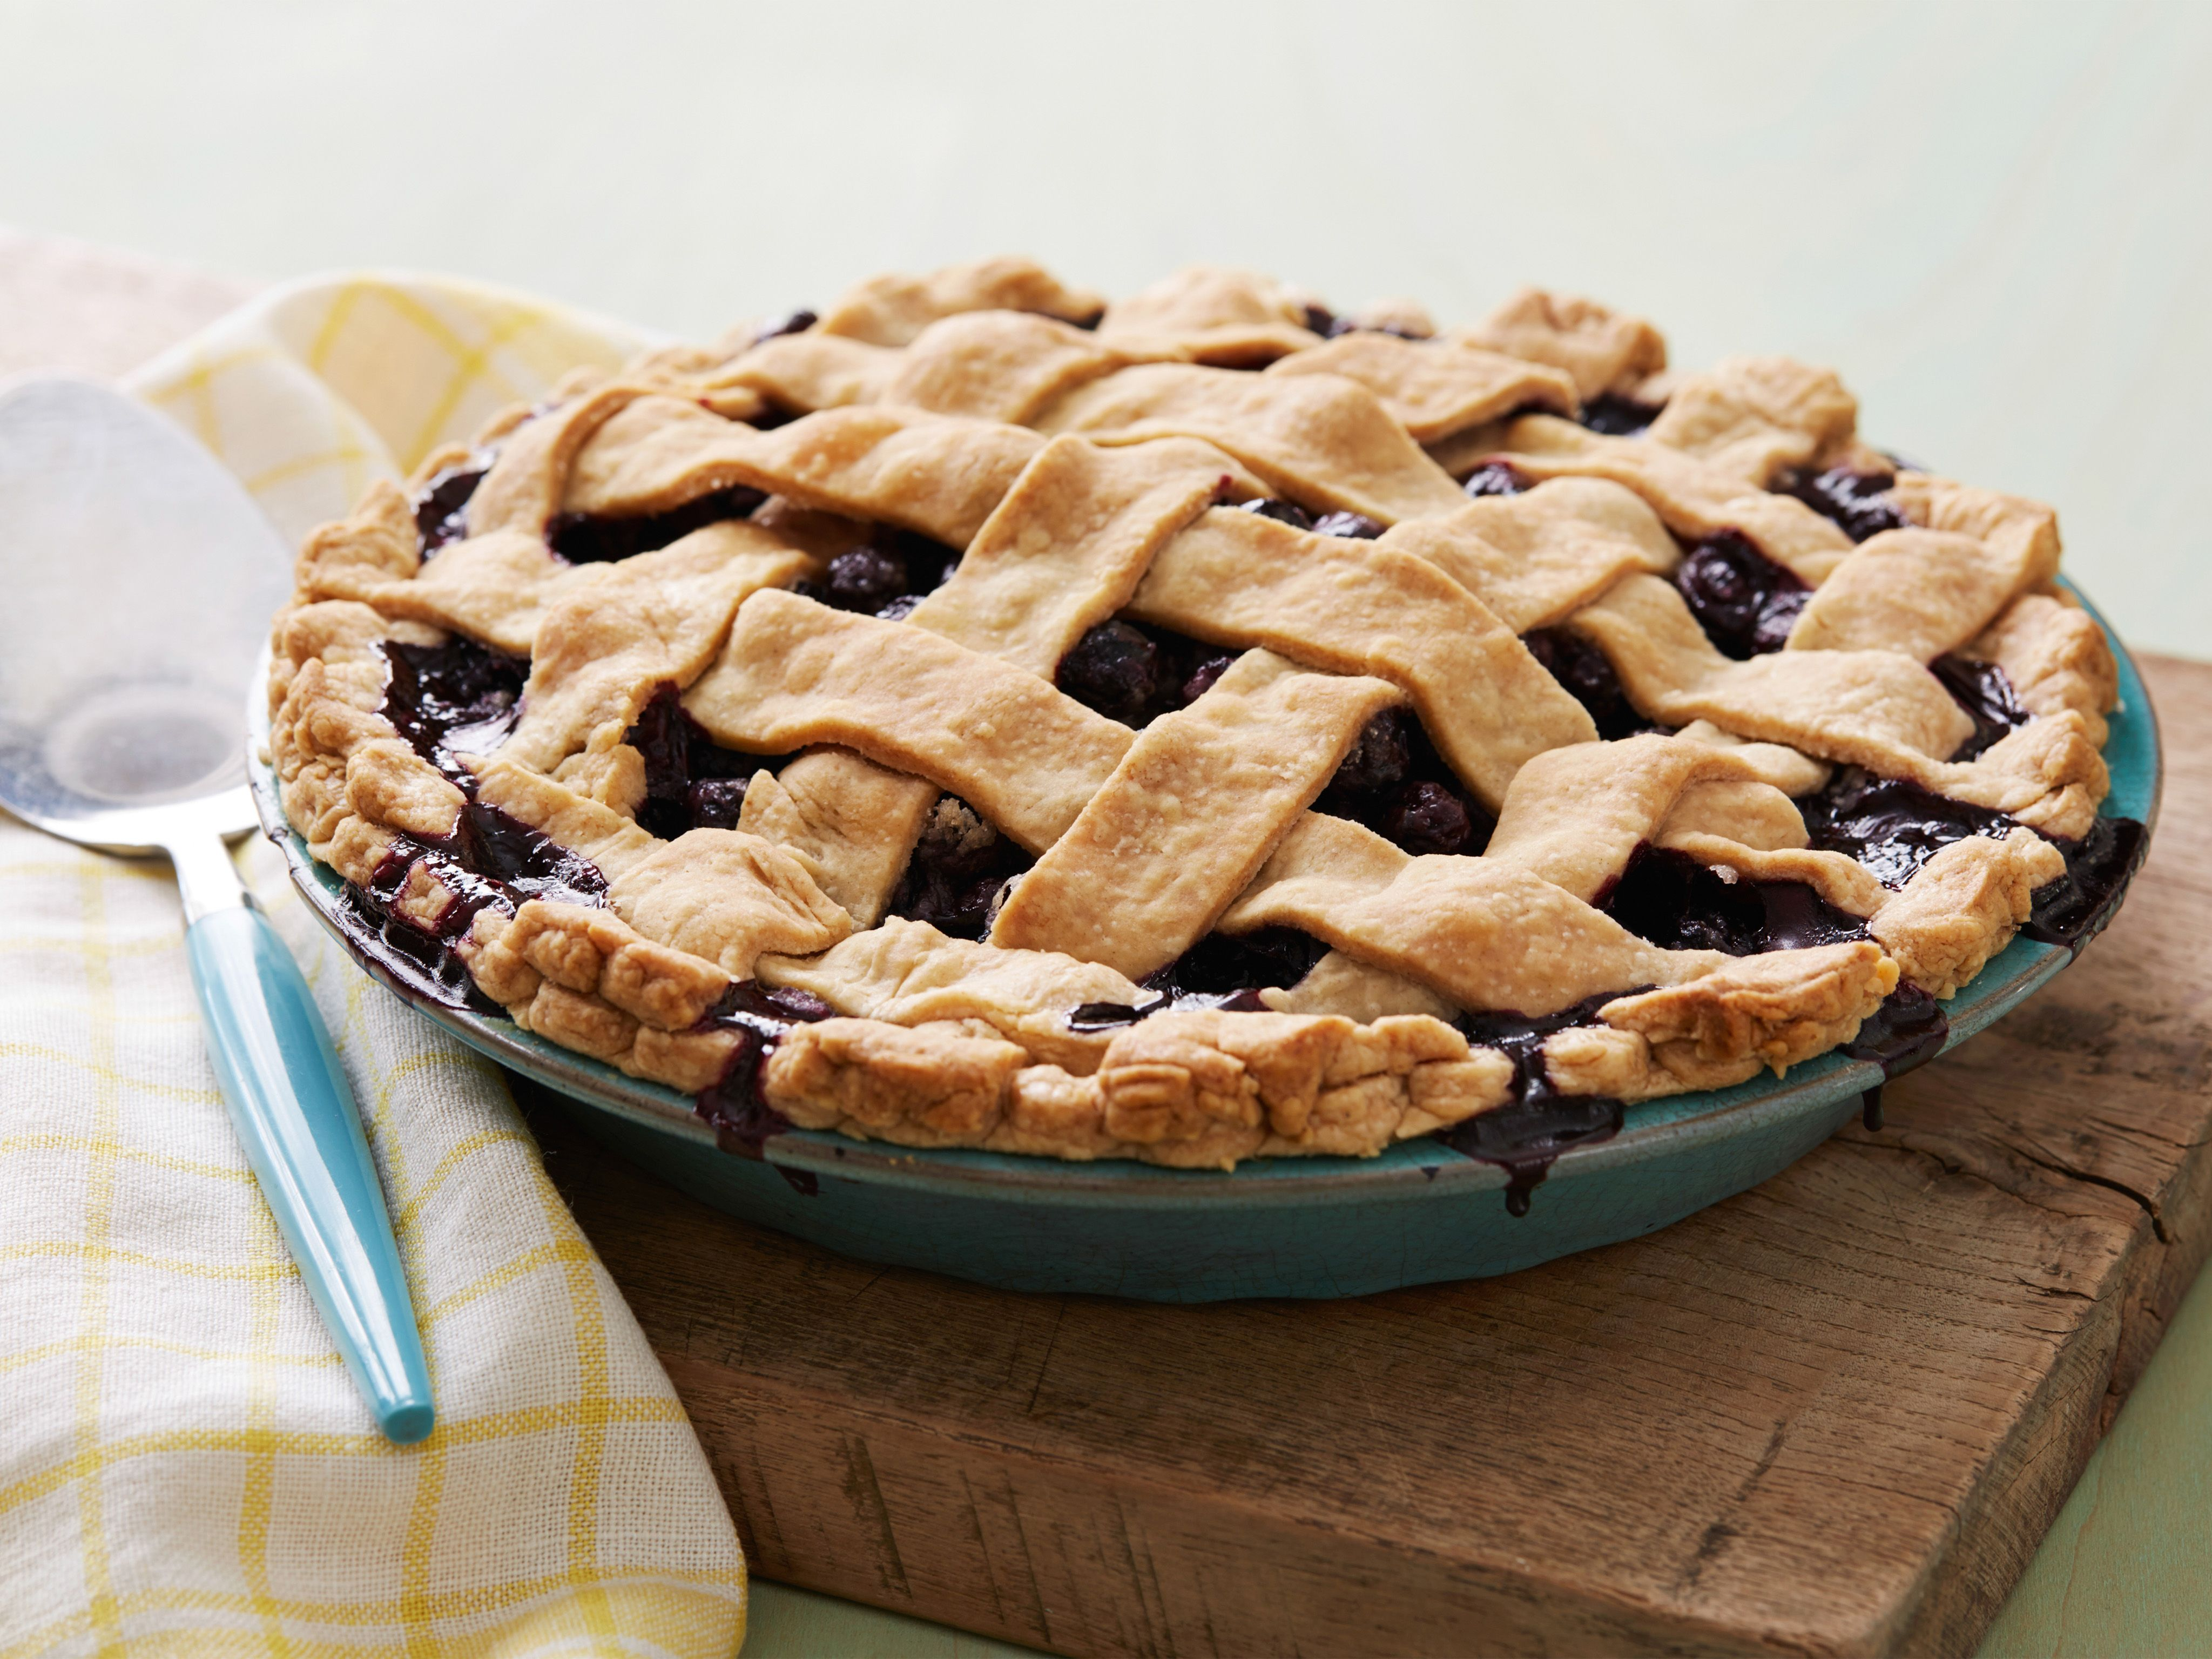 Blueberry pie recipe food network recipes dessert